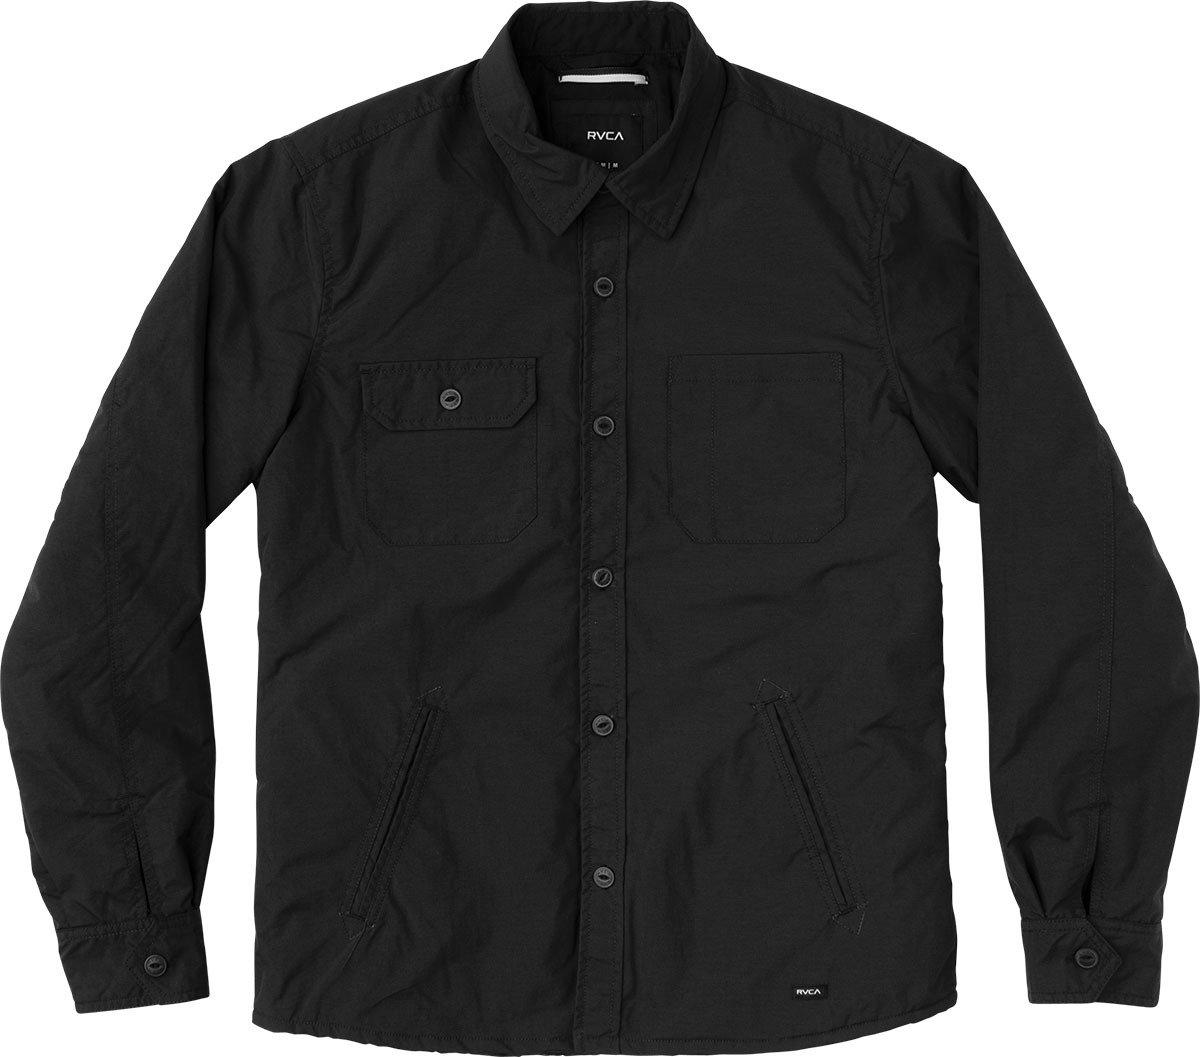 RVCA Men's CPO Shirt Jacket, Black, Large